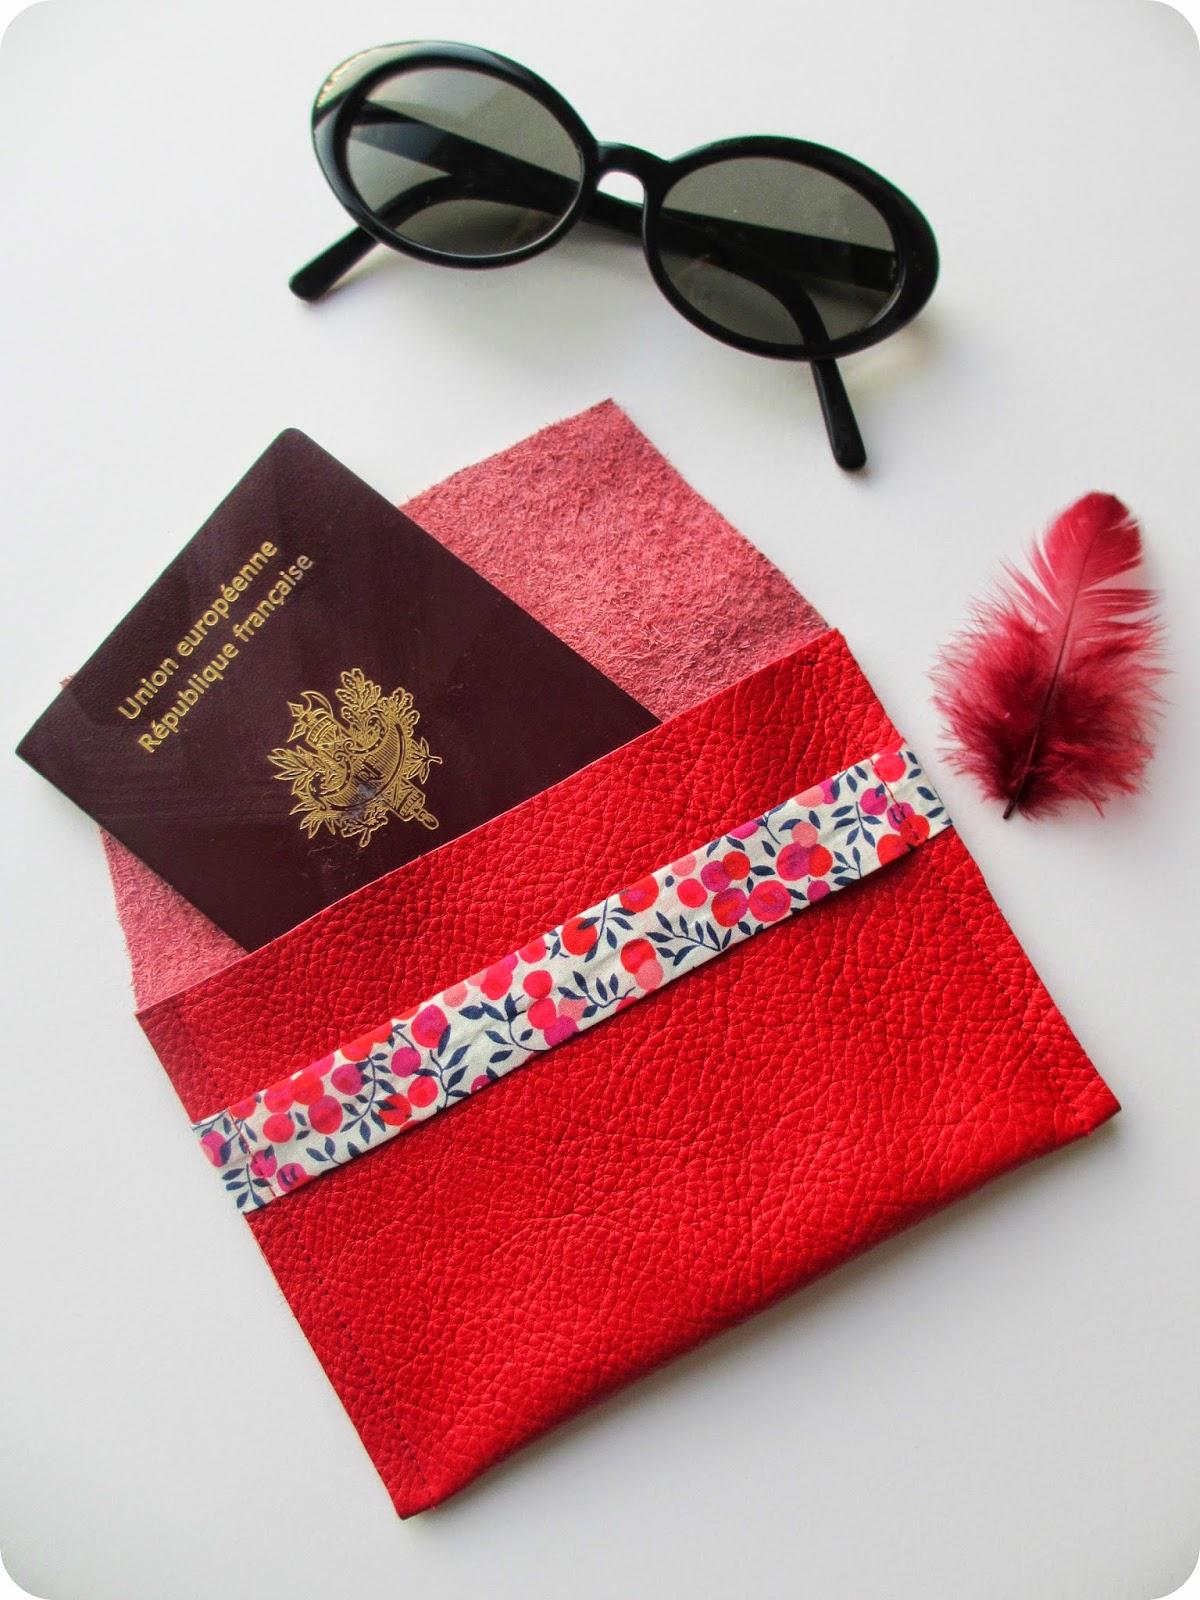 tadaam diy tuto pochette passeport. Black Bedroom Furniture Sets. Home Design Ideas